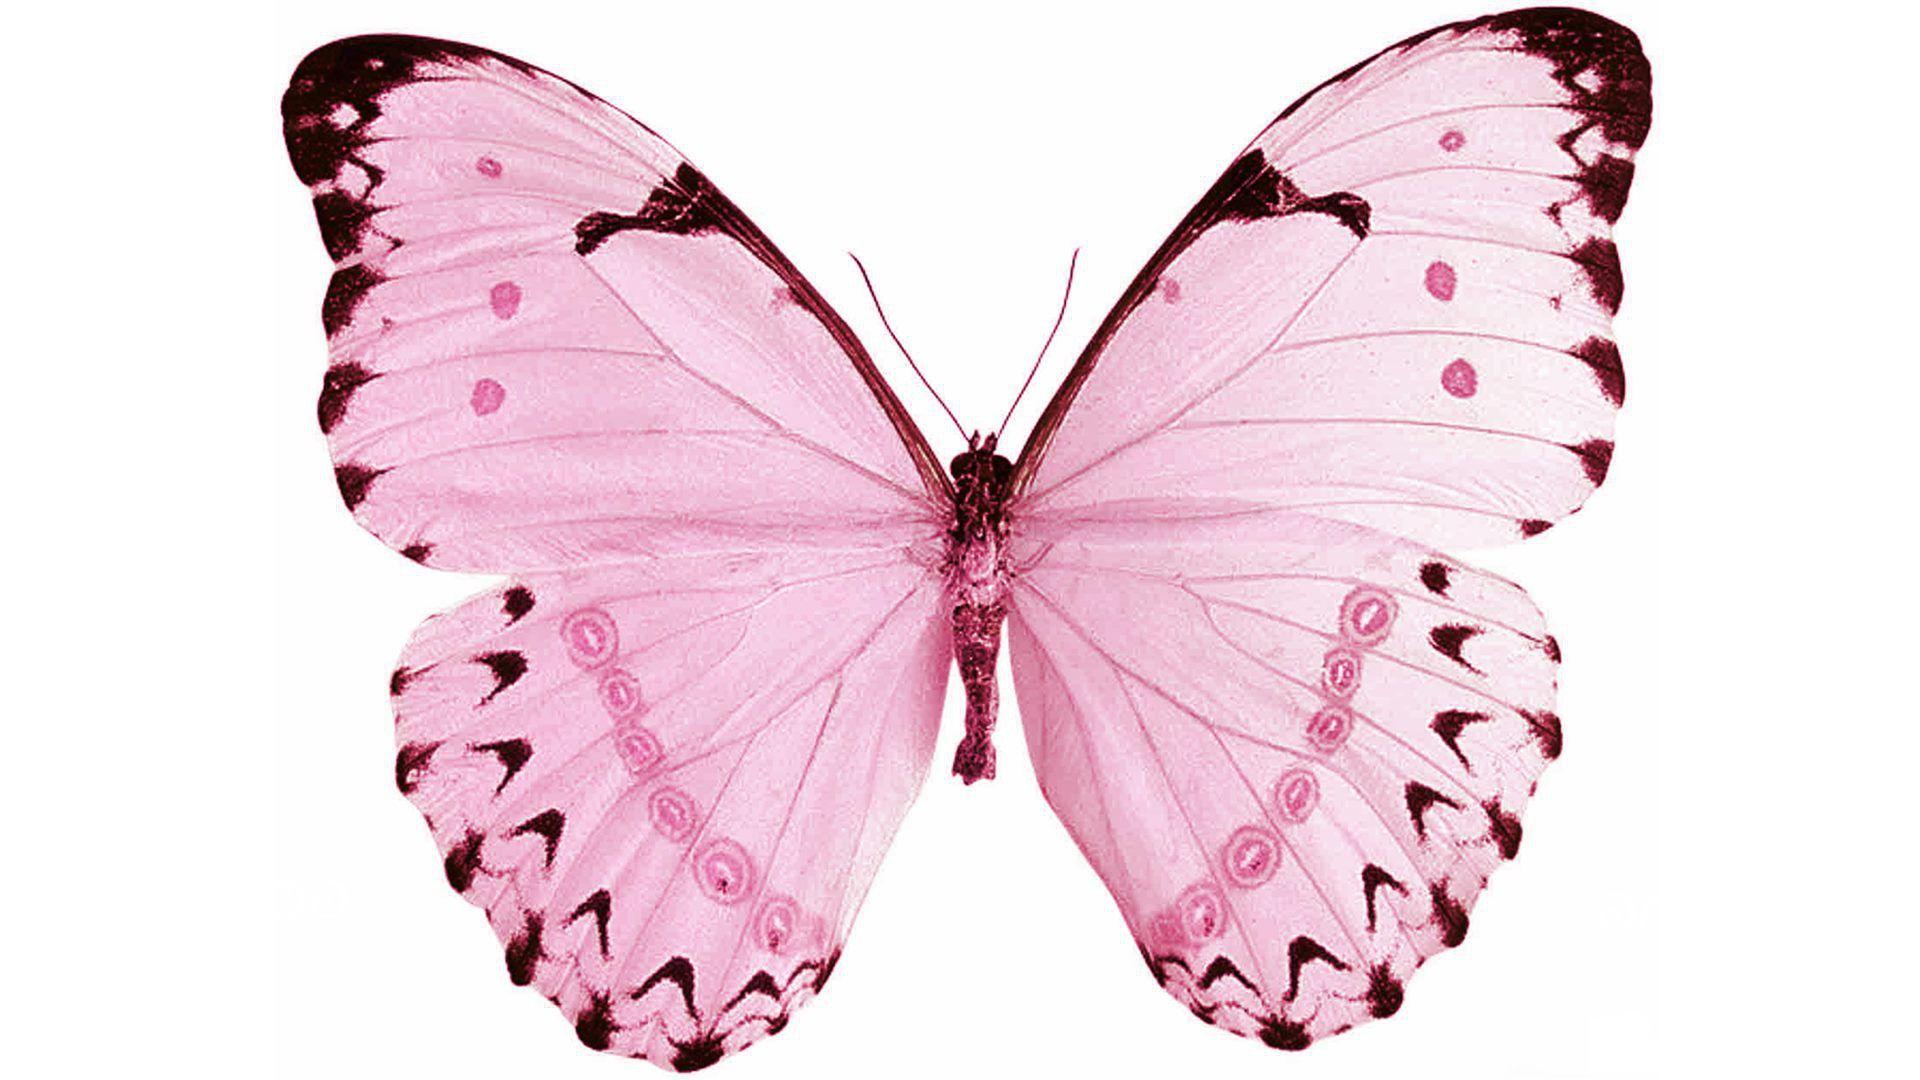 Pin By Gabi Negoescu On Tutorial Template Pink Butterfly Butterfly Art Painting Butterfly Wallpaper